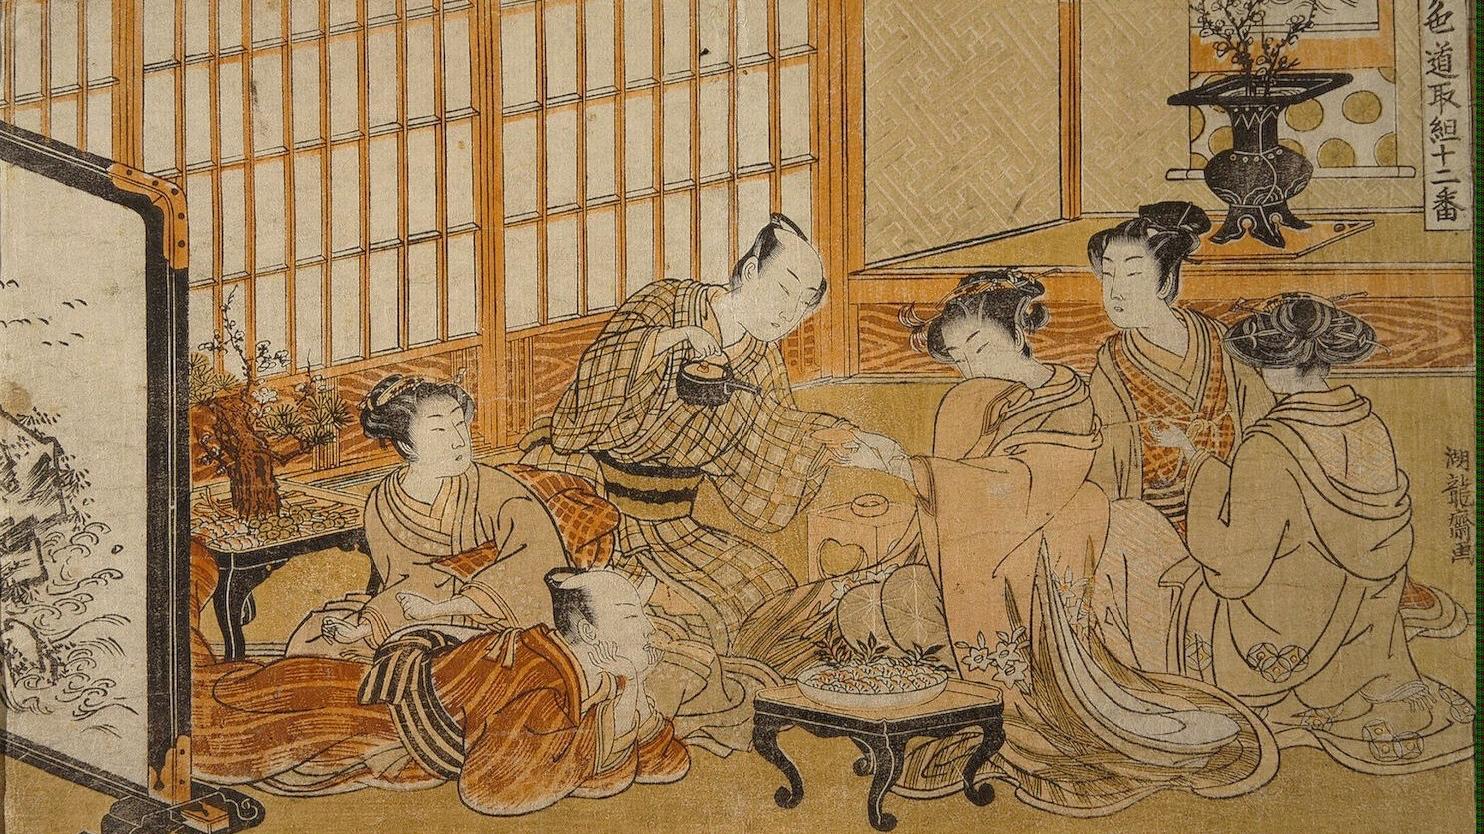 Tea-Ceremony-Isoda-Koryusai-oil-painting-2.jpg